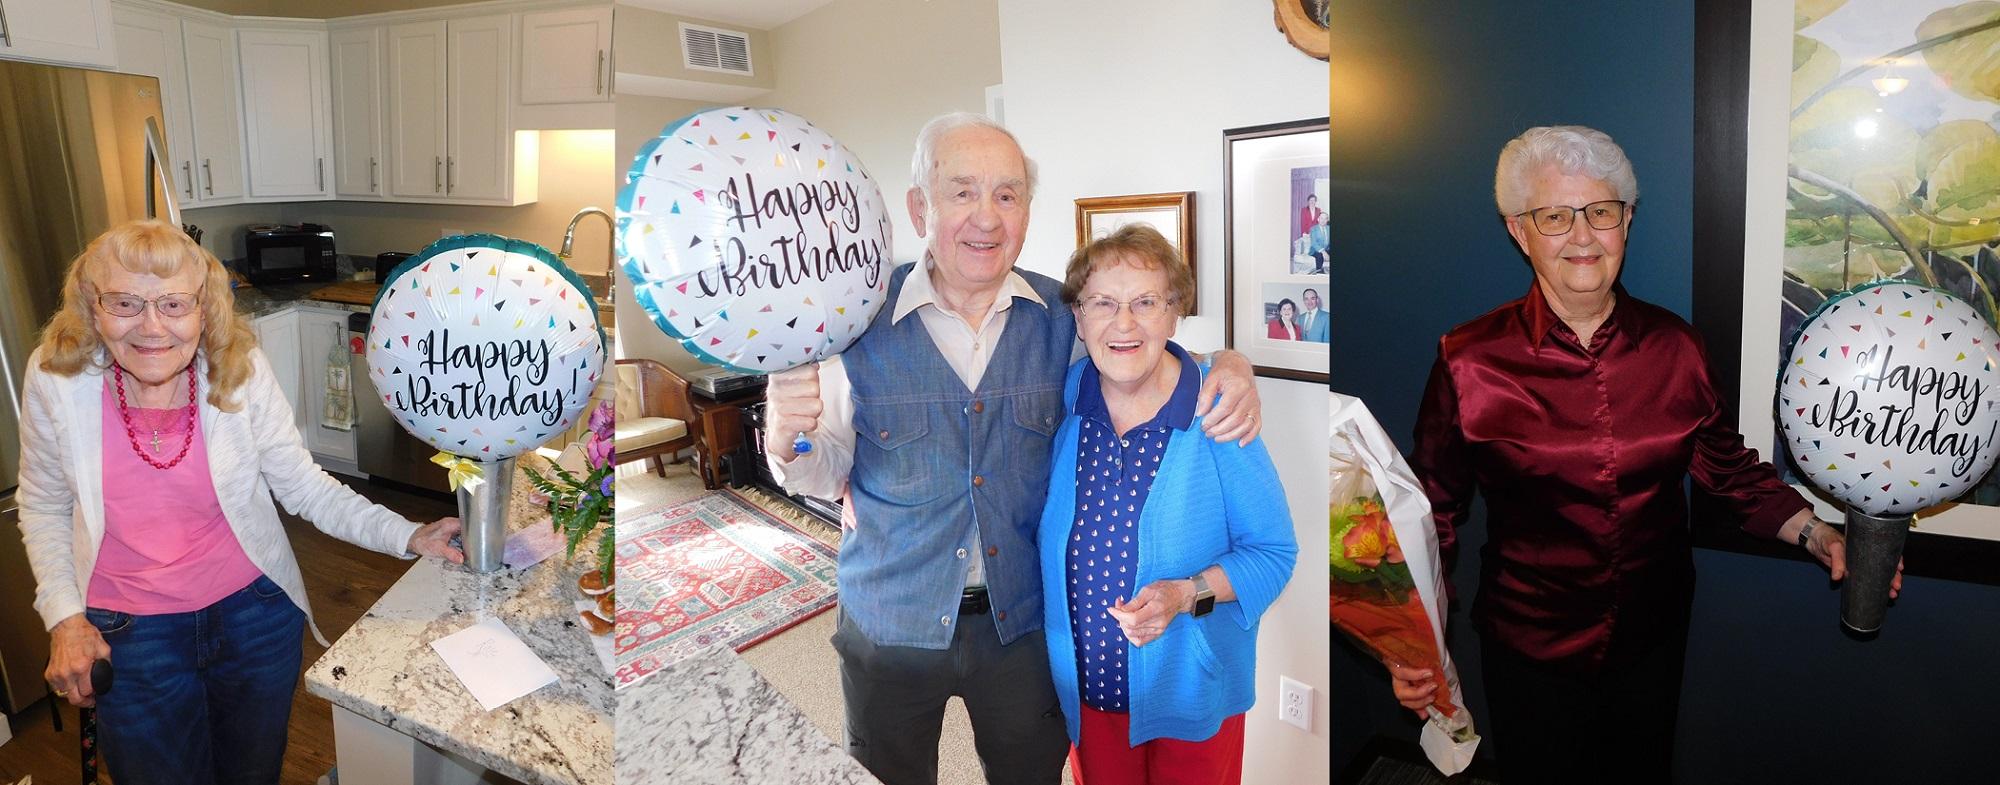 Celebrating birthdays during COVID-19